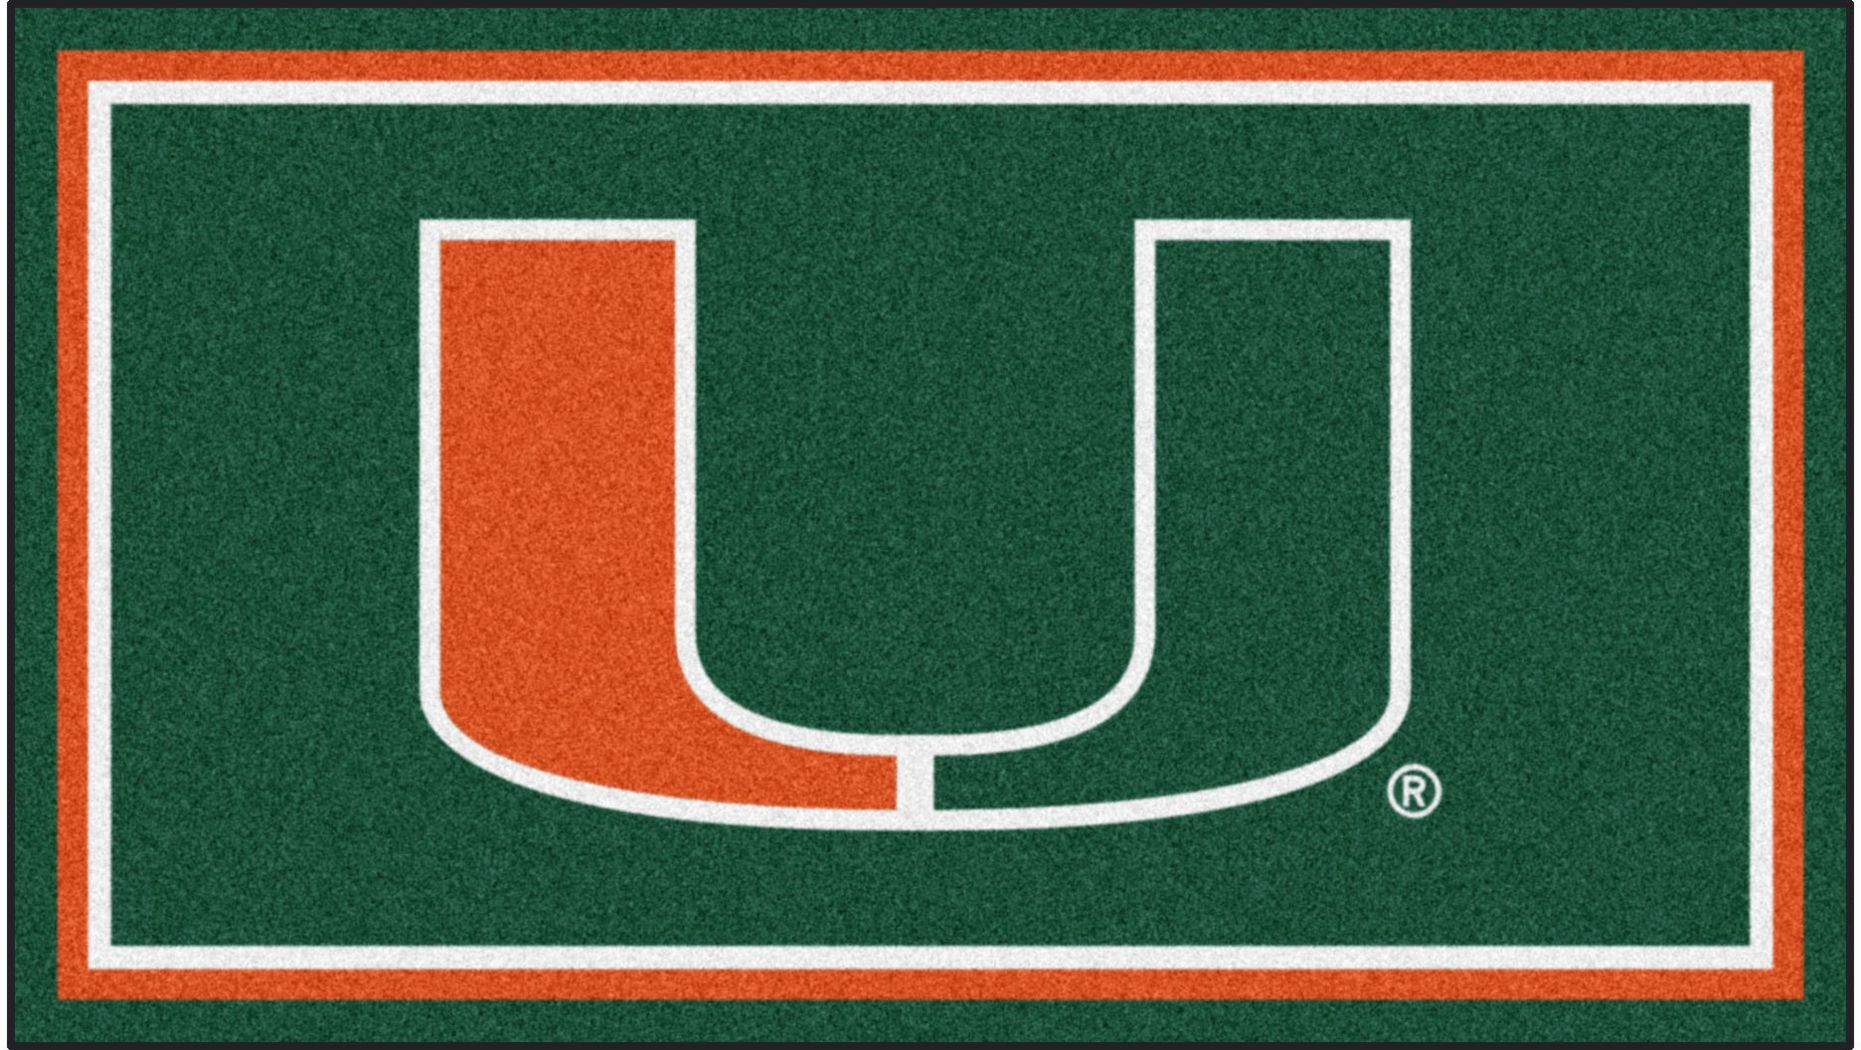 NCAA Big Game University of Miami 3' x 5' Rug